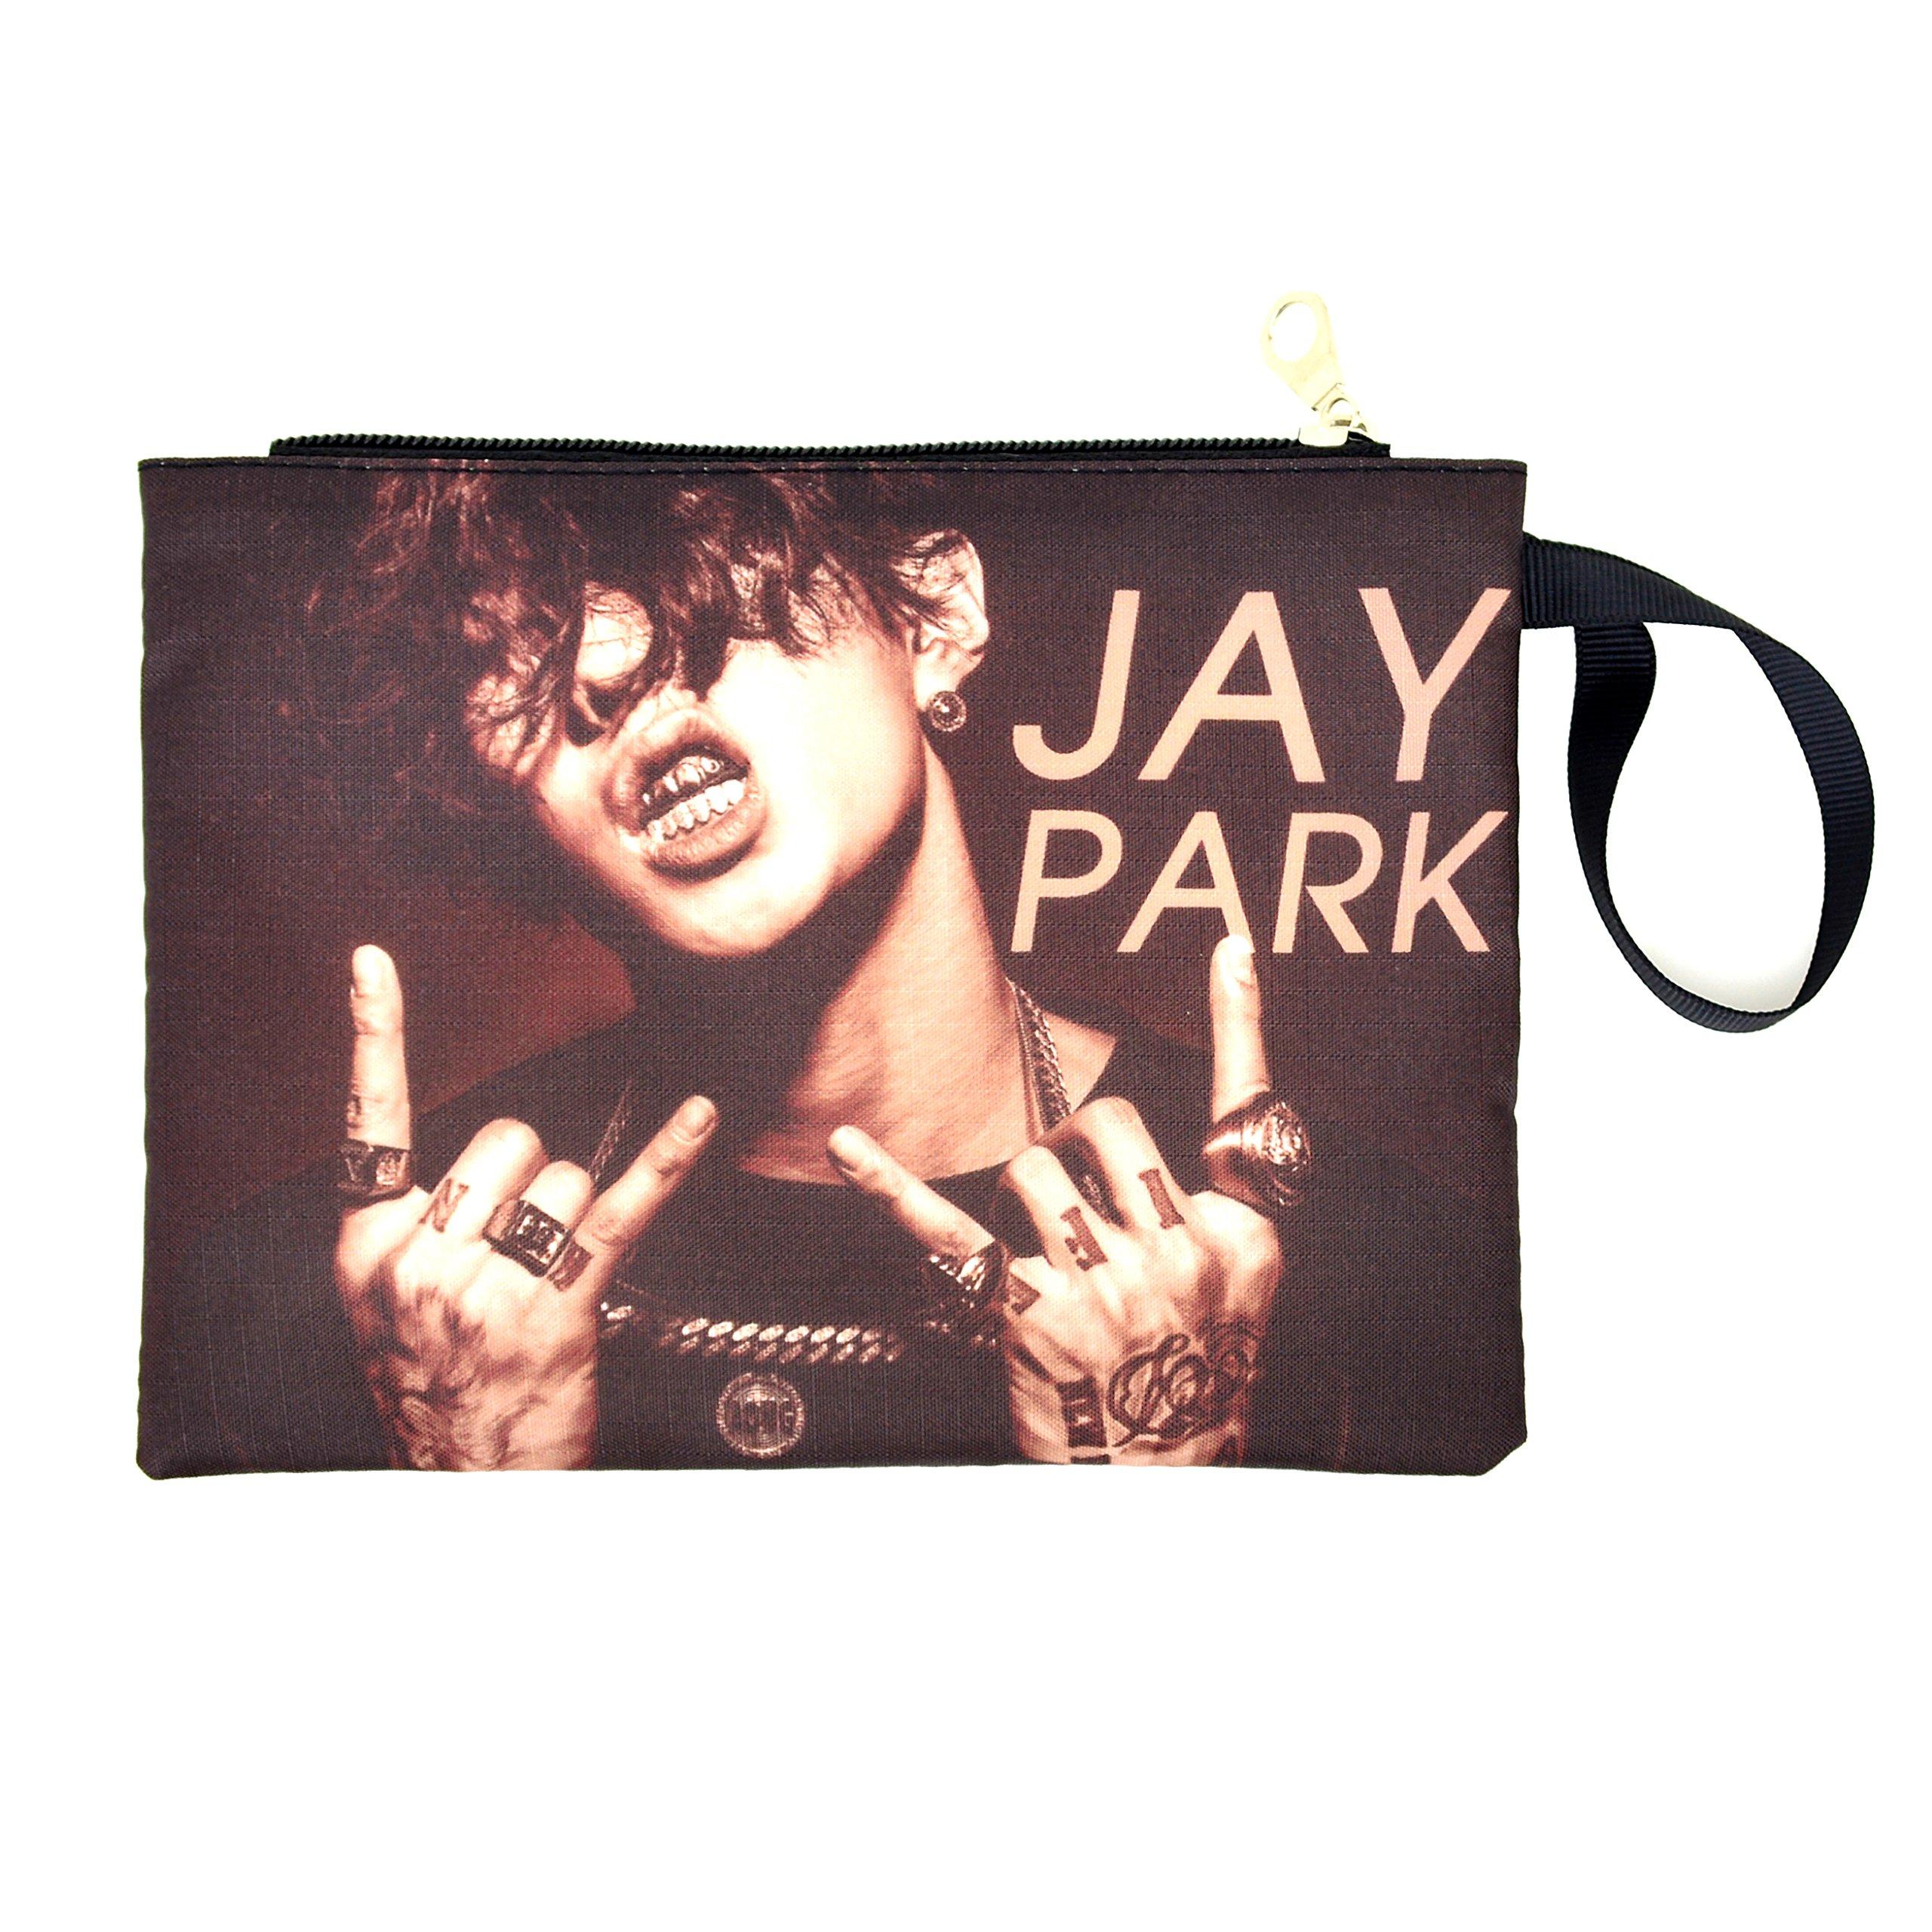 Kpop Jay Park bags pouch 490